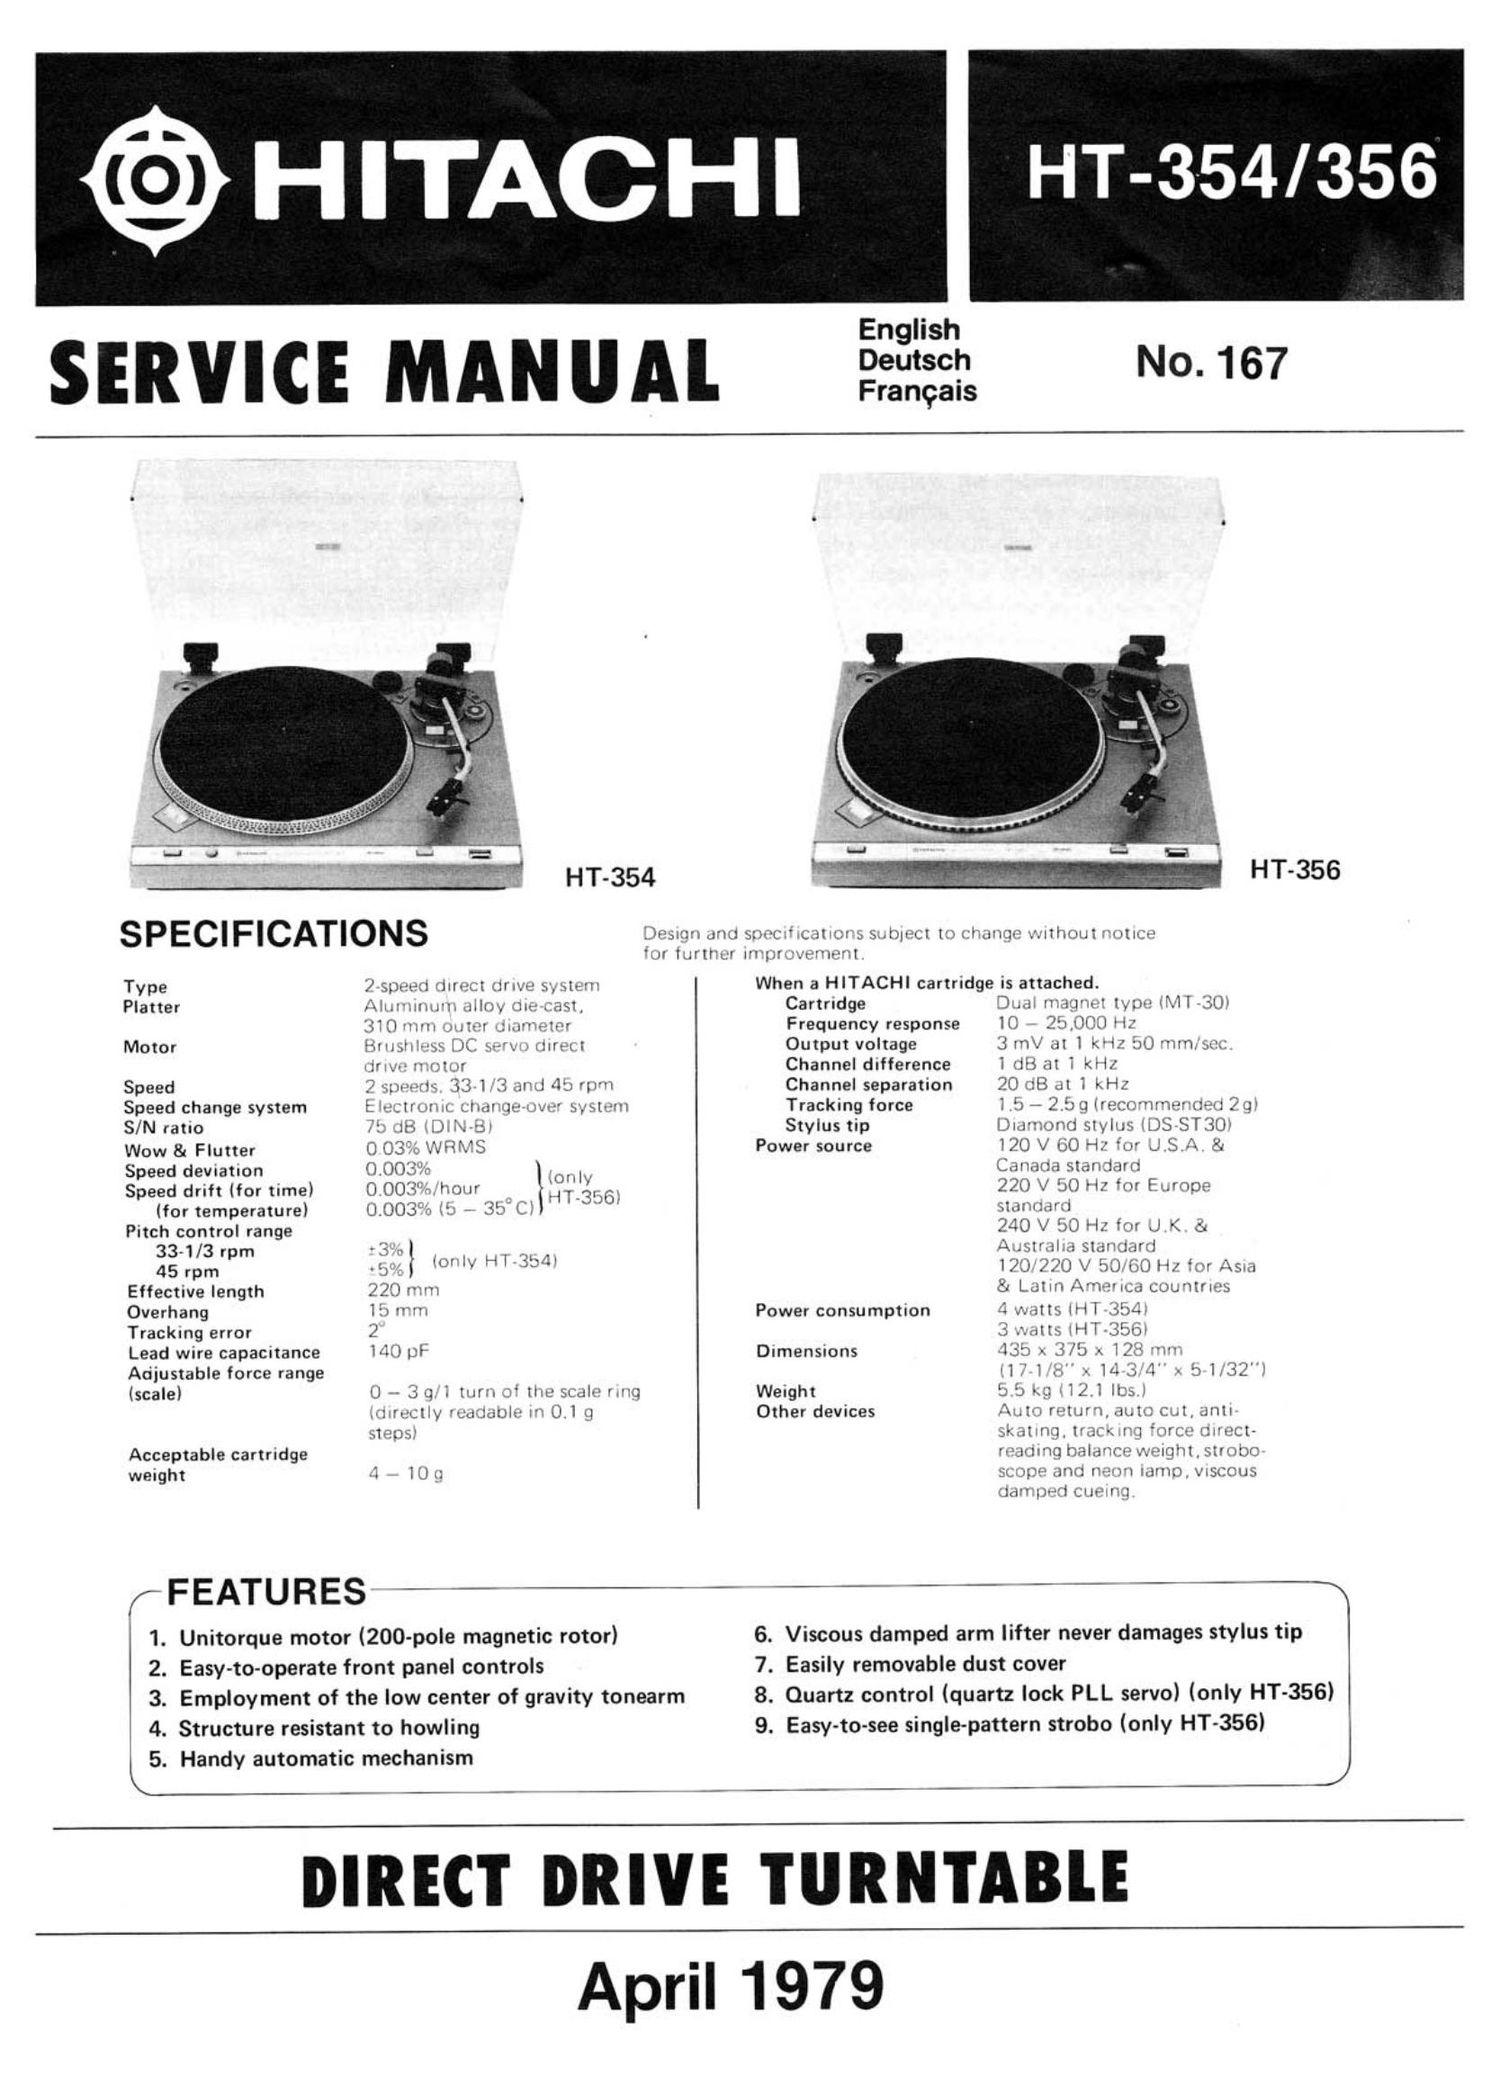 Download Hitachi Ht 354 Service Manual